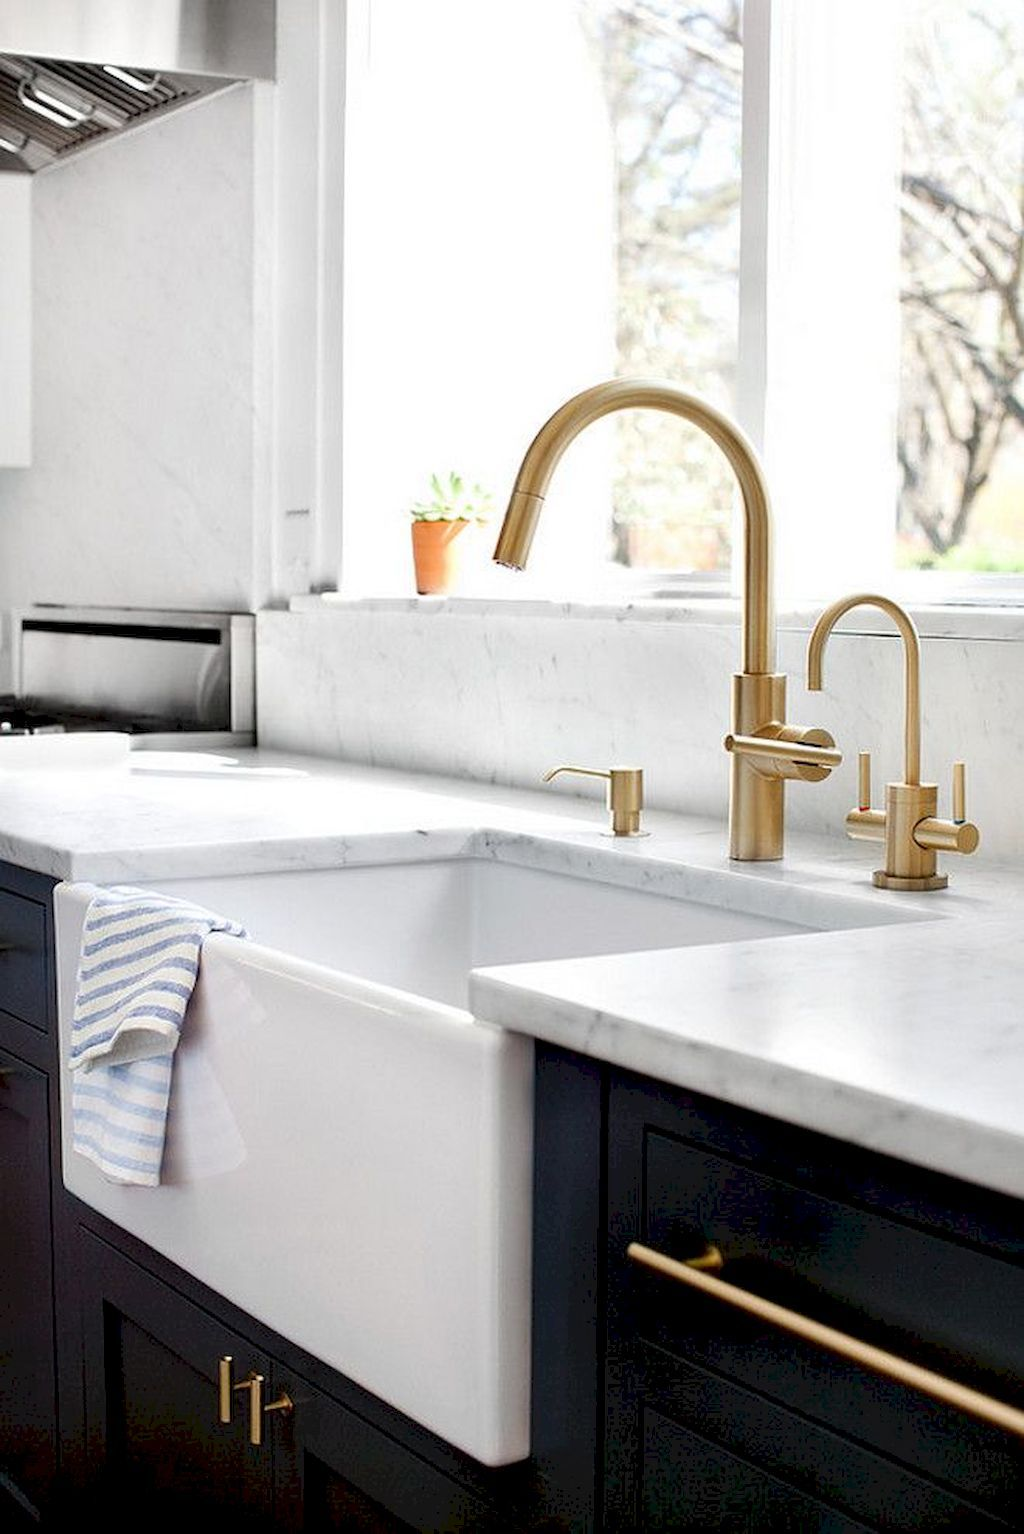 Shairoom Com Artsy Home Inspiration Kitchen Renovation Design Farmhouse Sink Kitchen Brass Kitchen Faucet